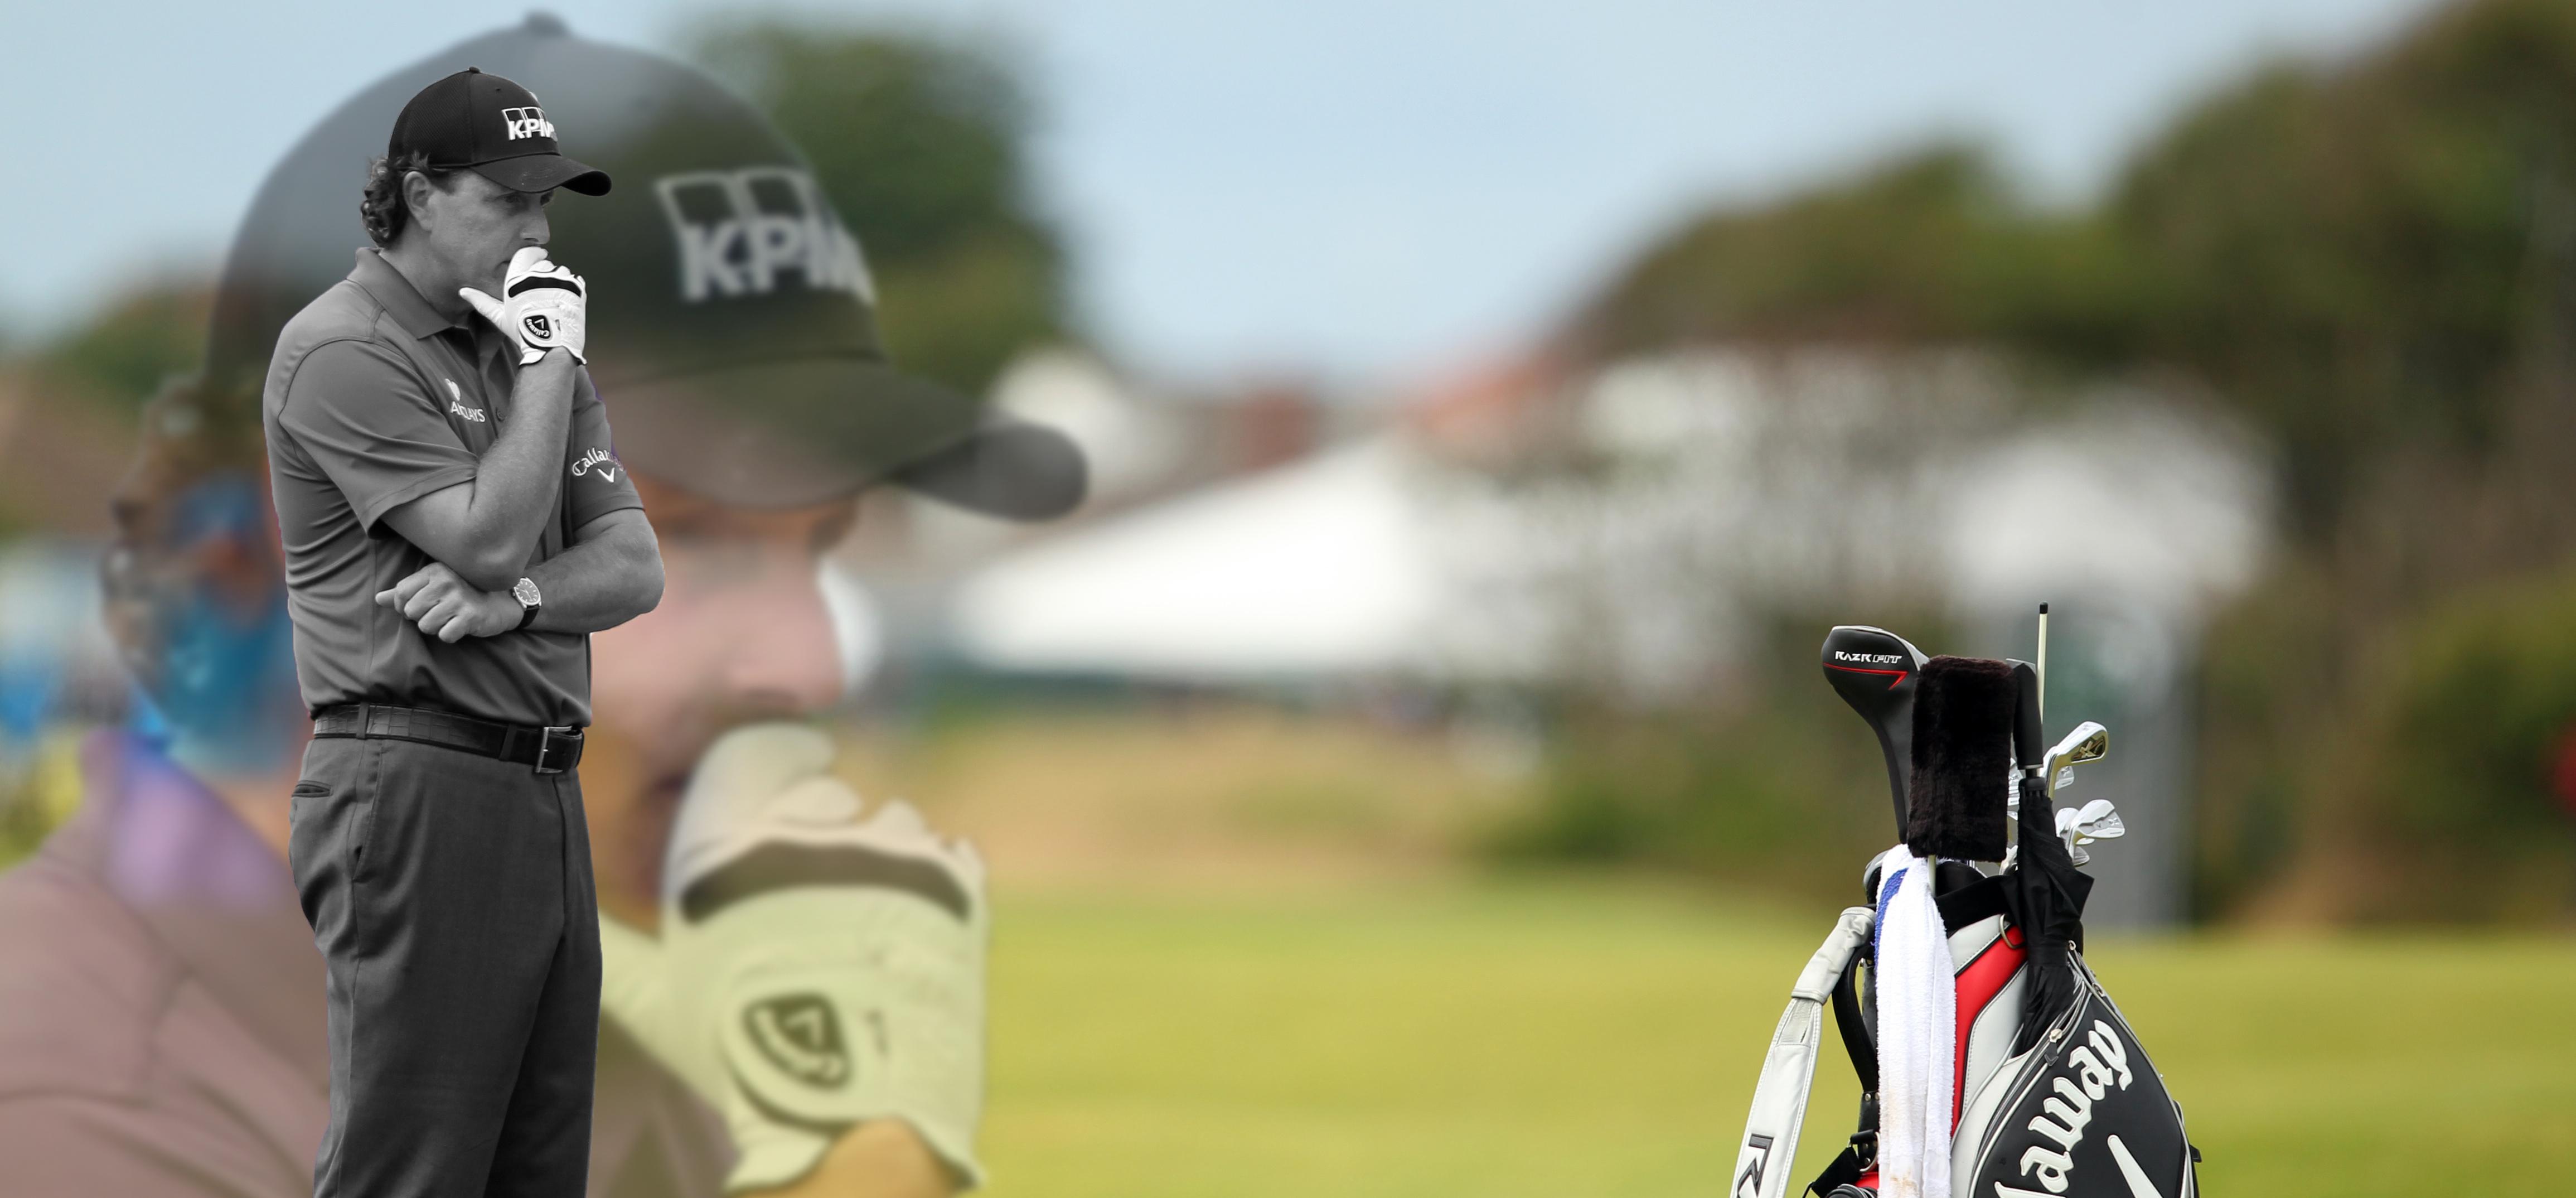 Phil Mickelson British Open 2012